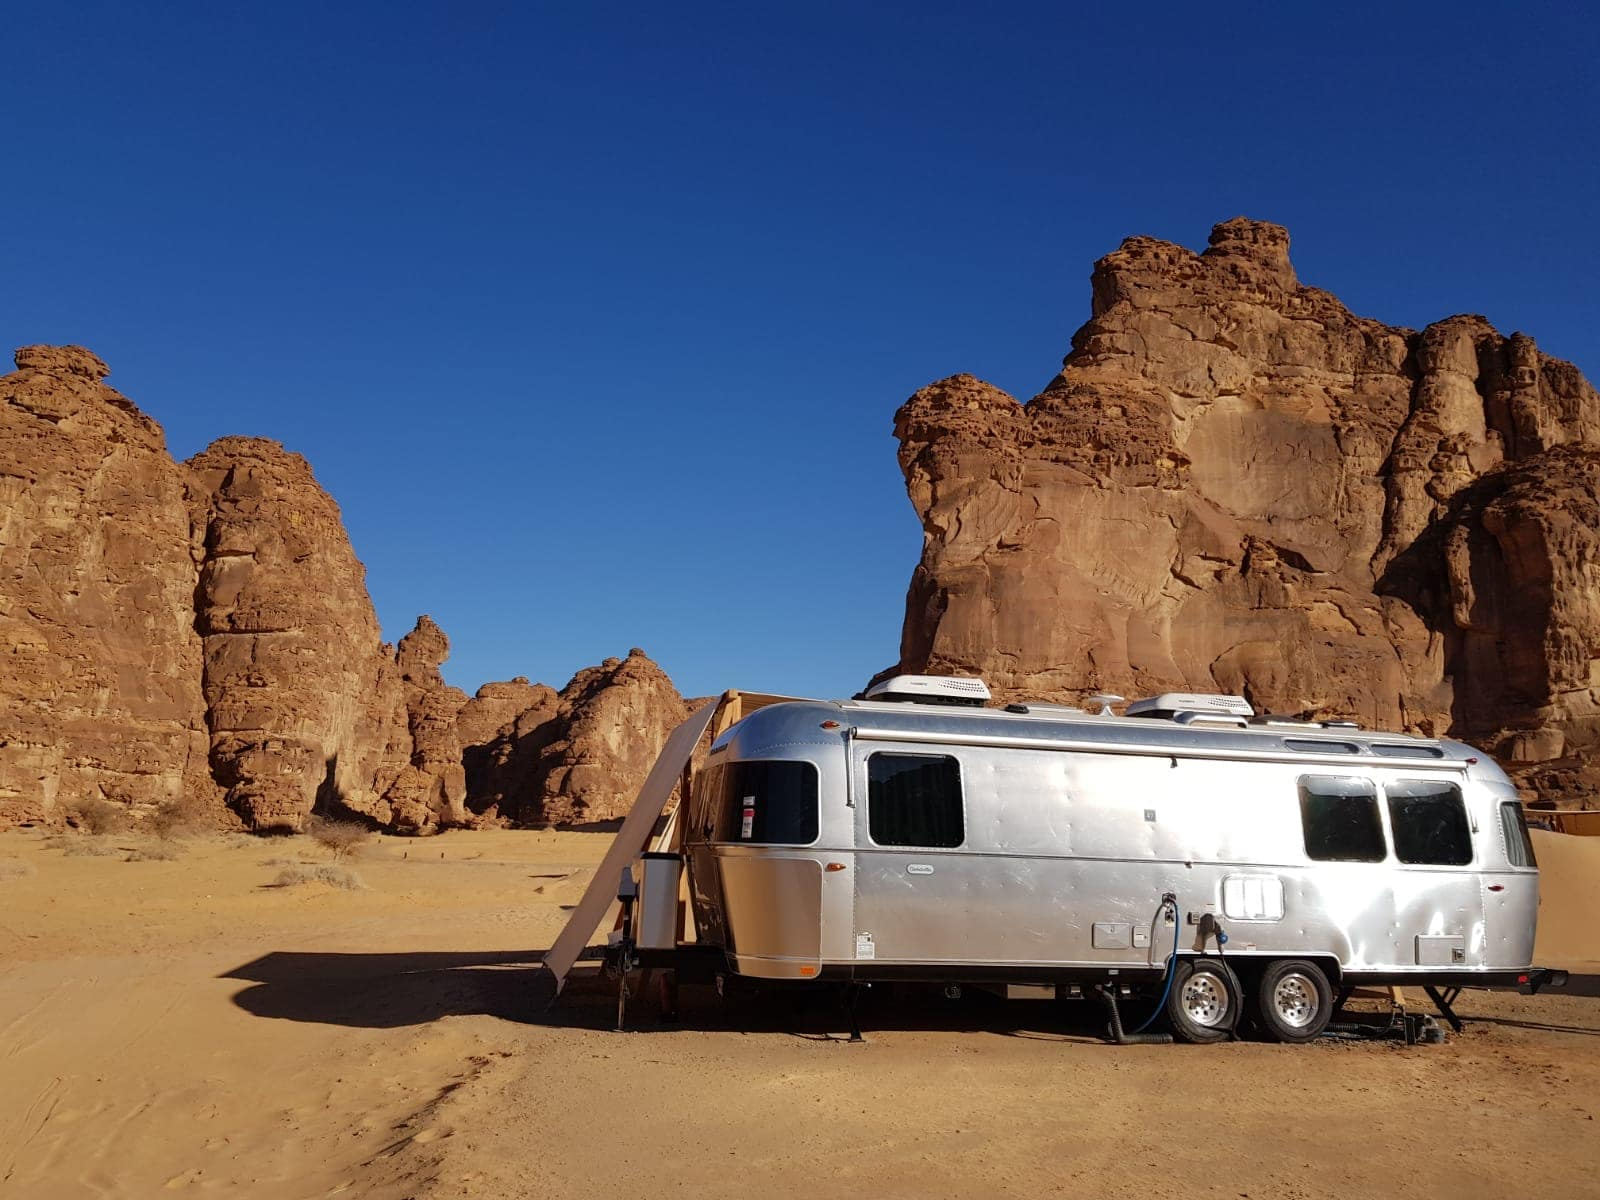 Airstream in der Wüste Saudi-Arabiens